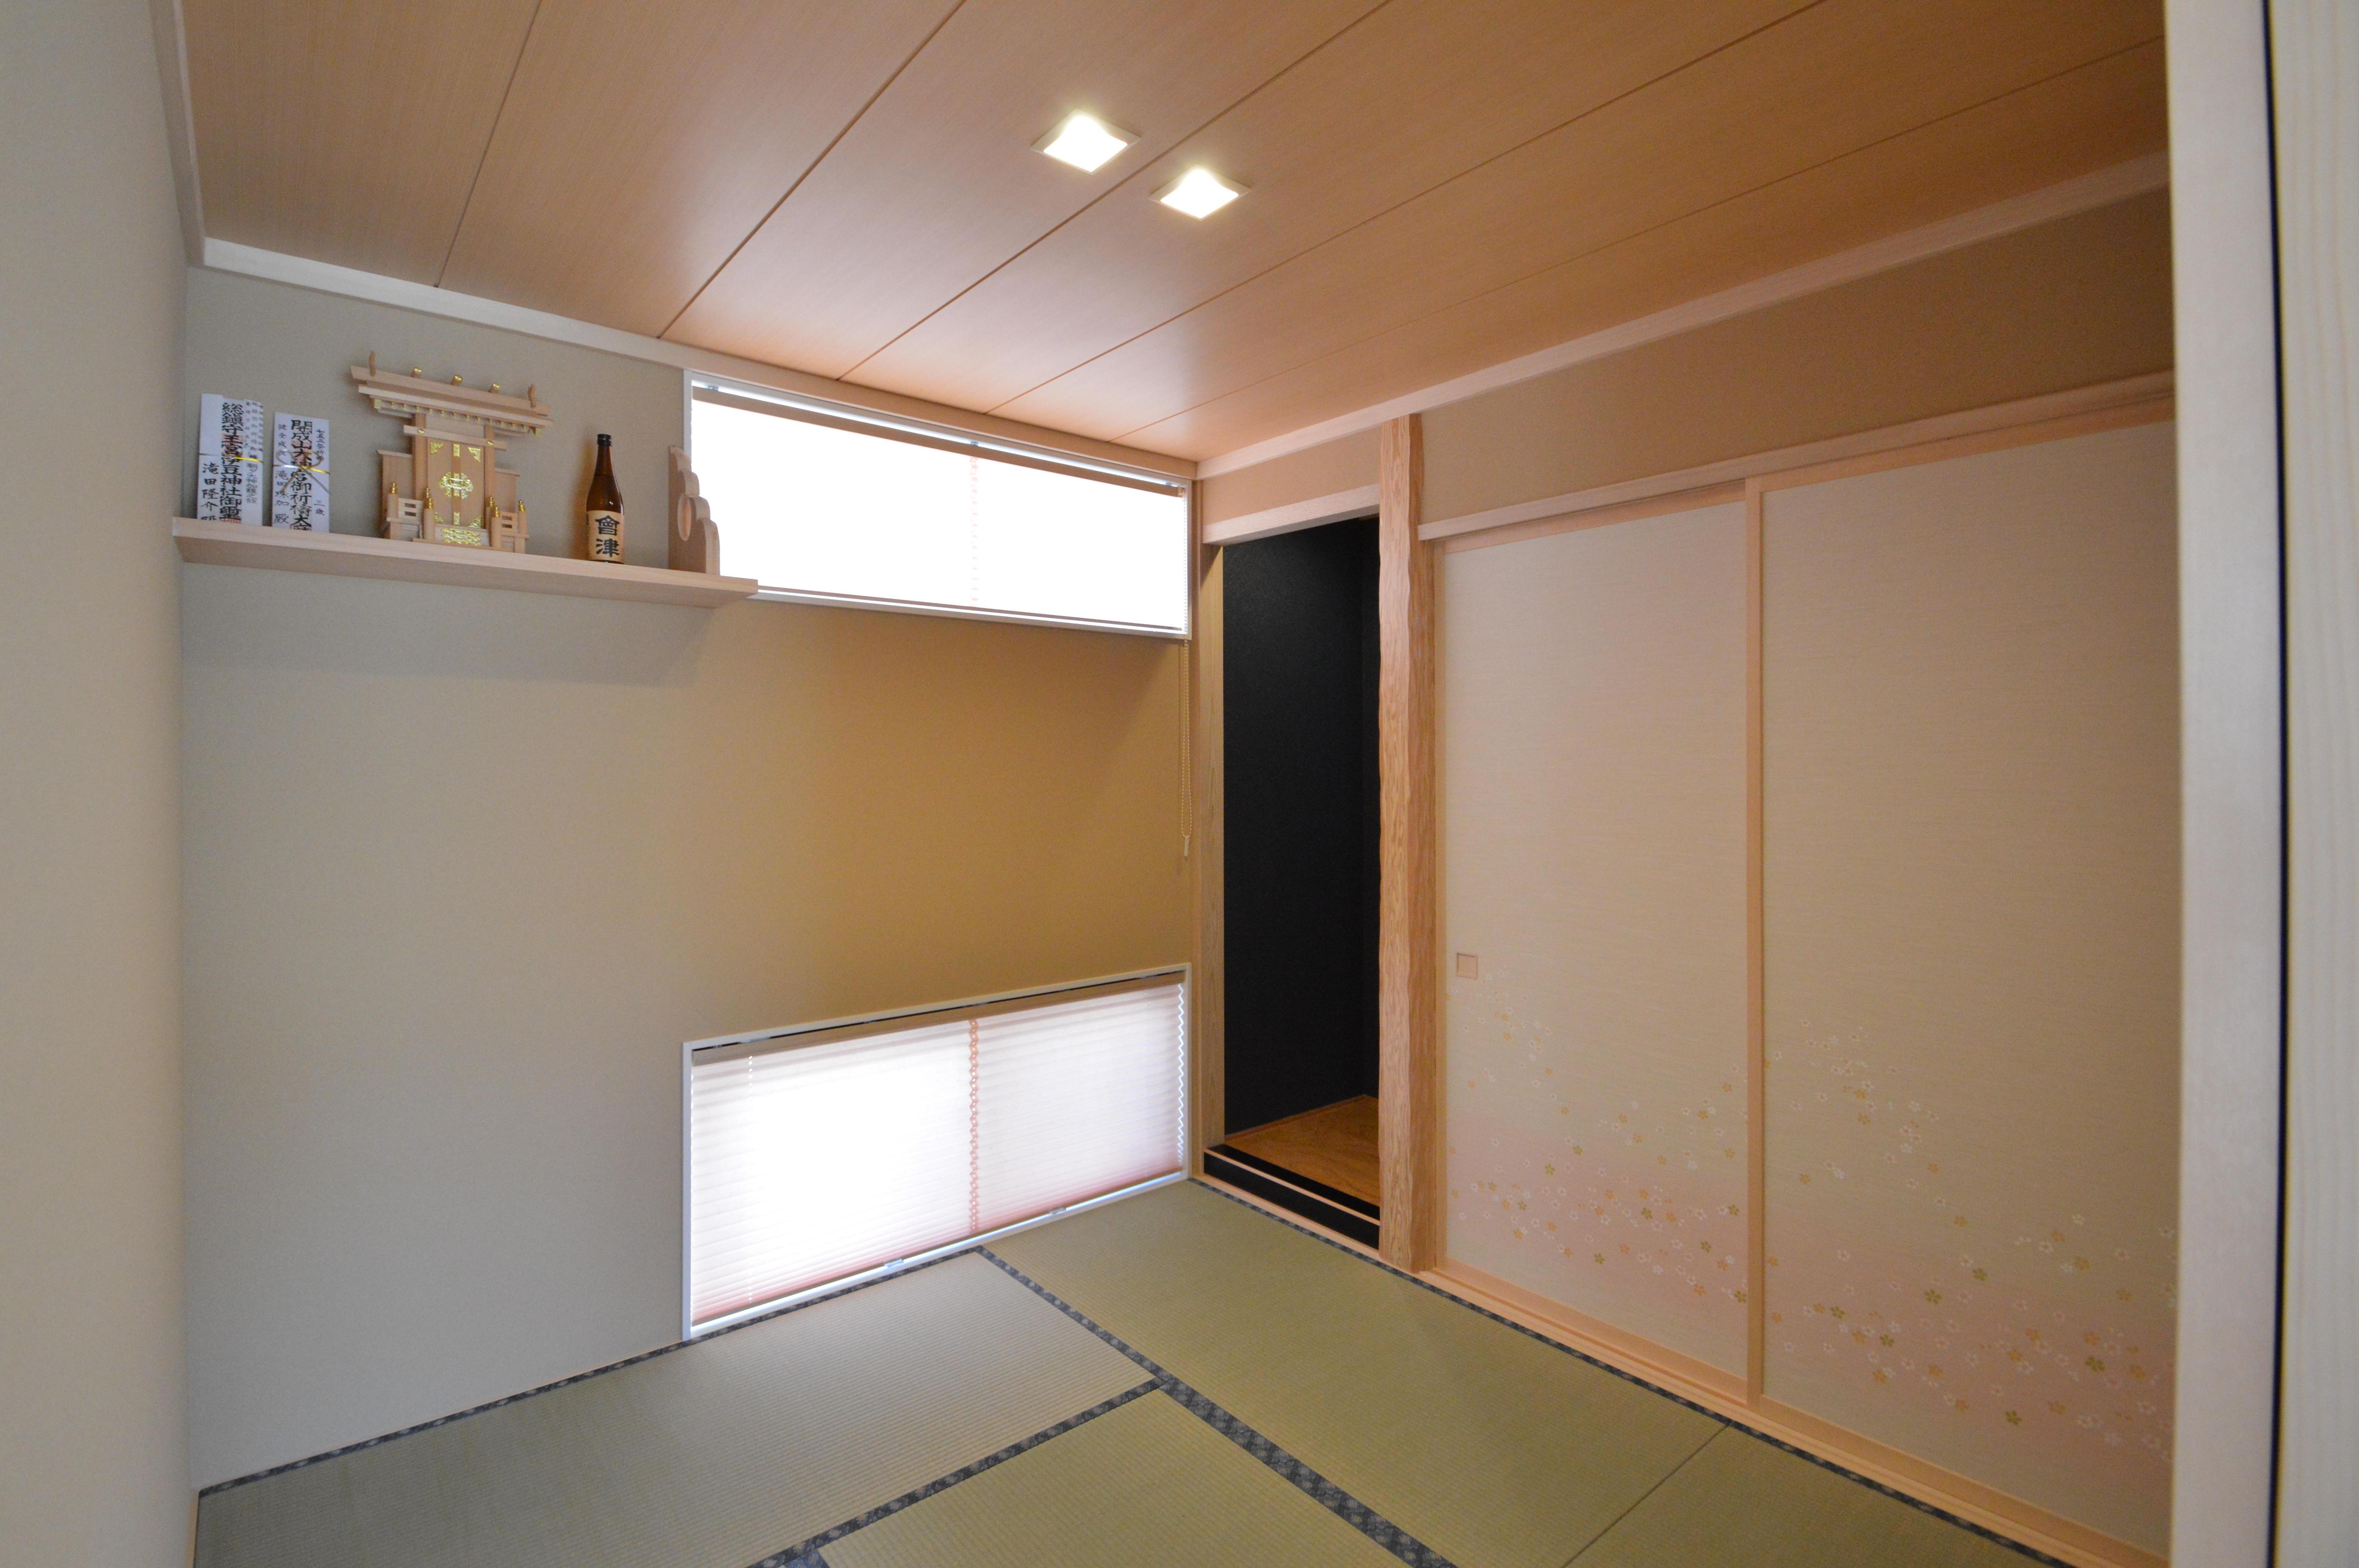 https://www.lixil-reformshop.jp/shop/SP00000505/photos/DSC_0058.JPG